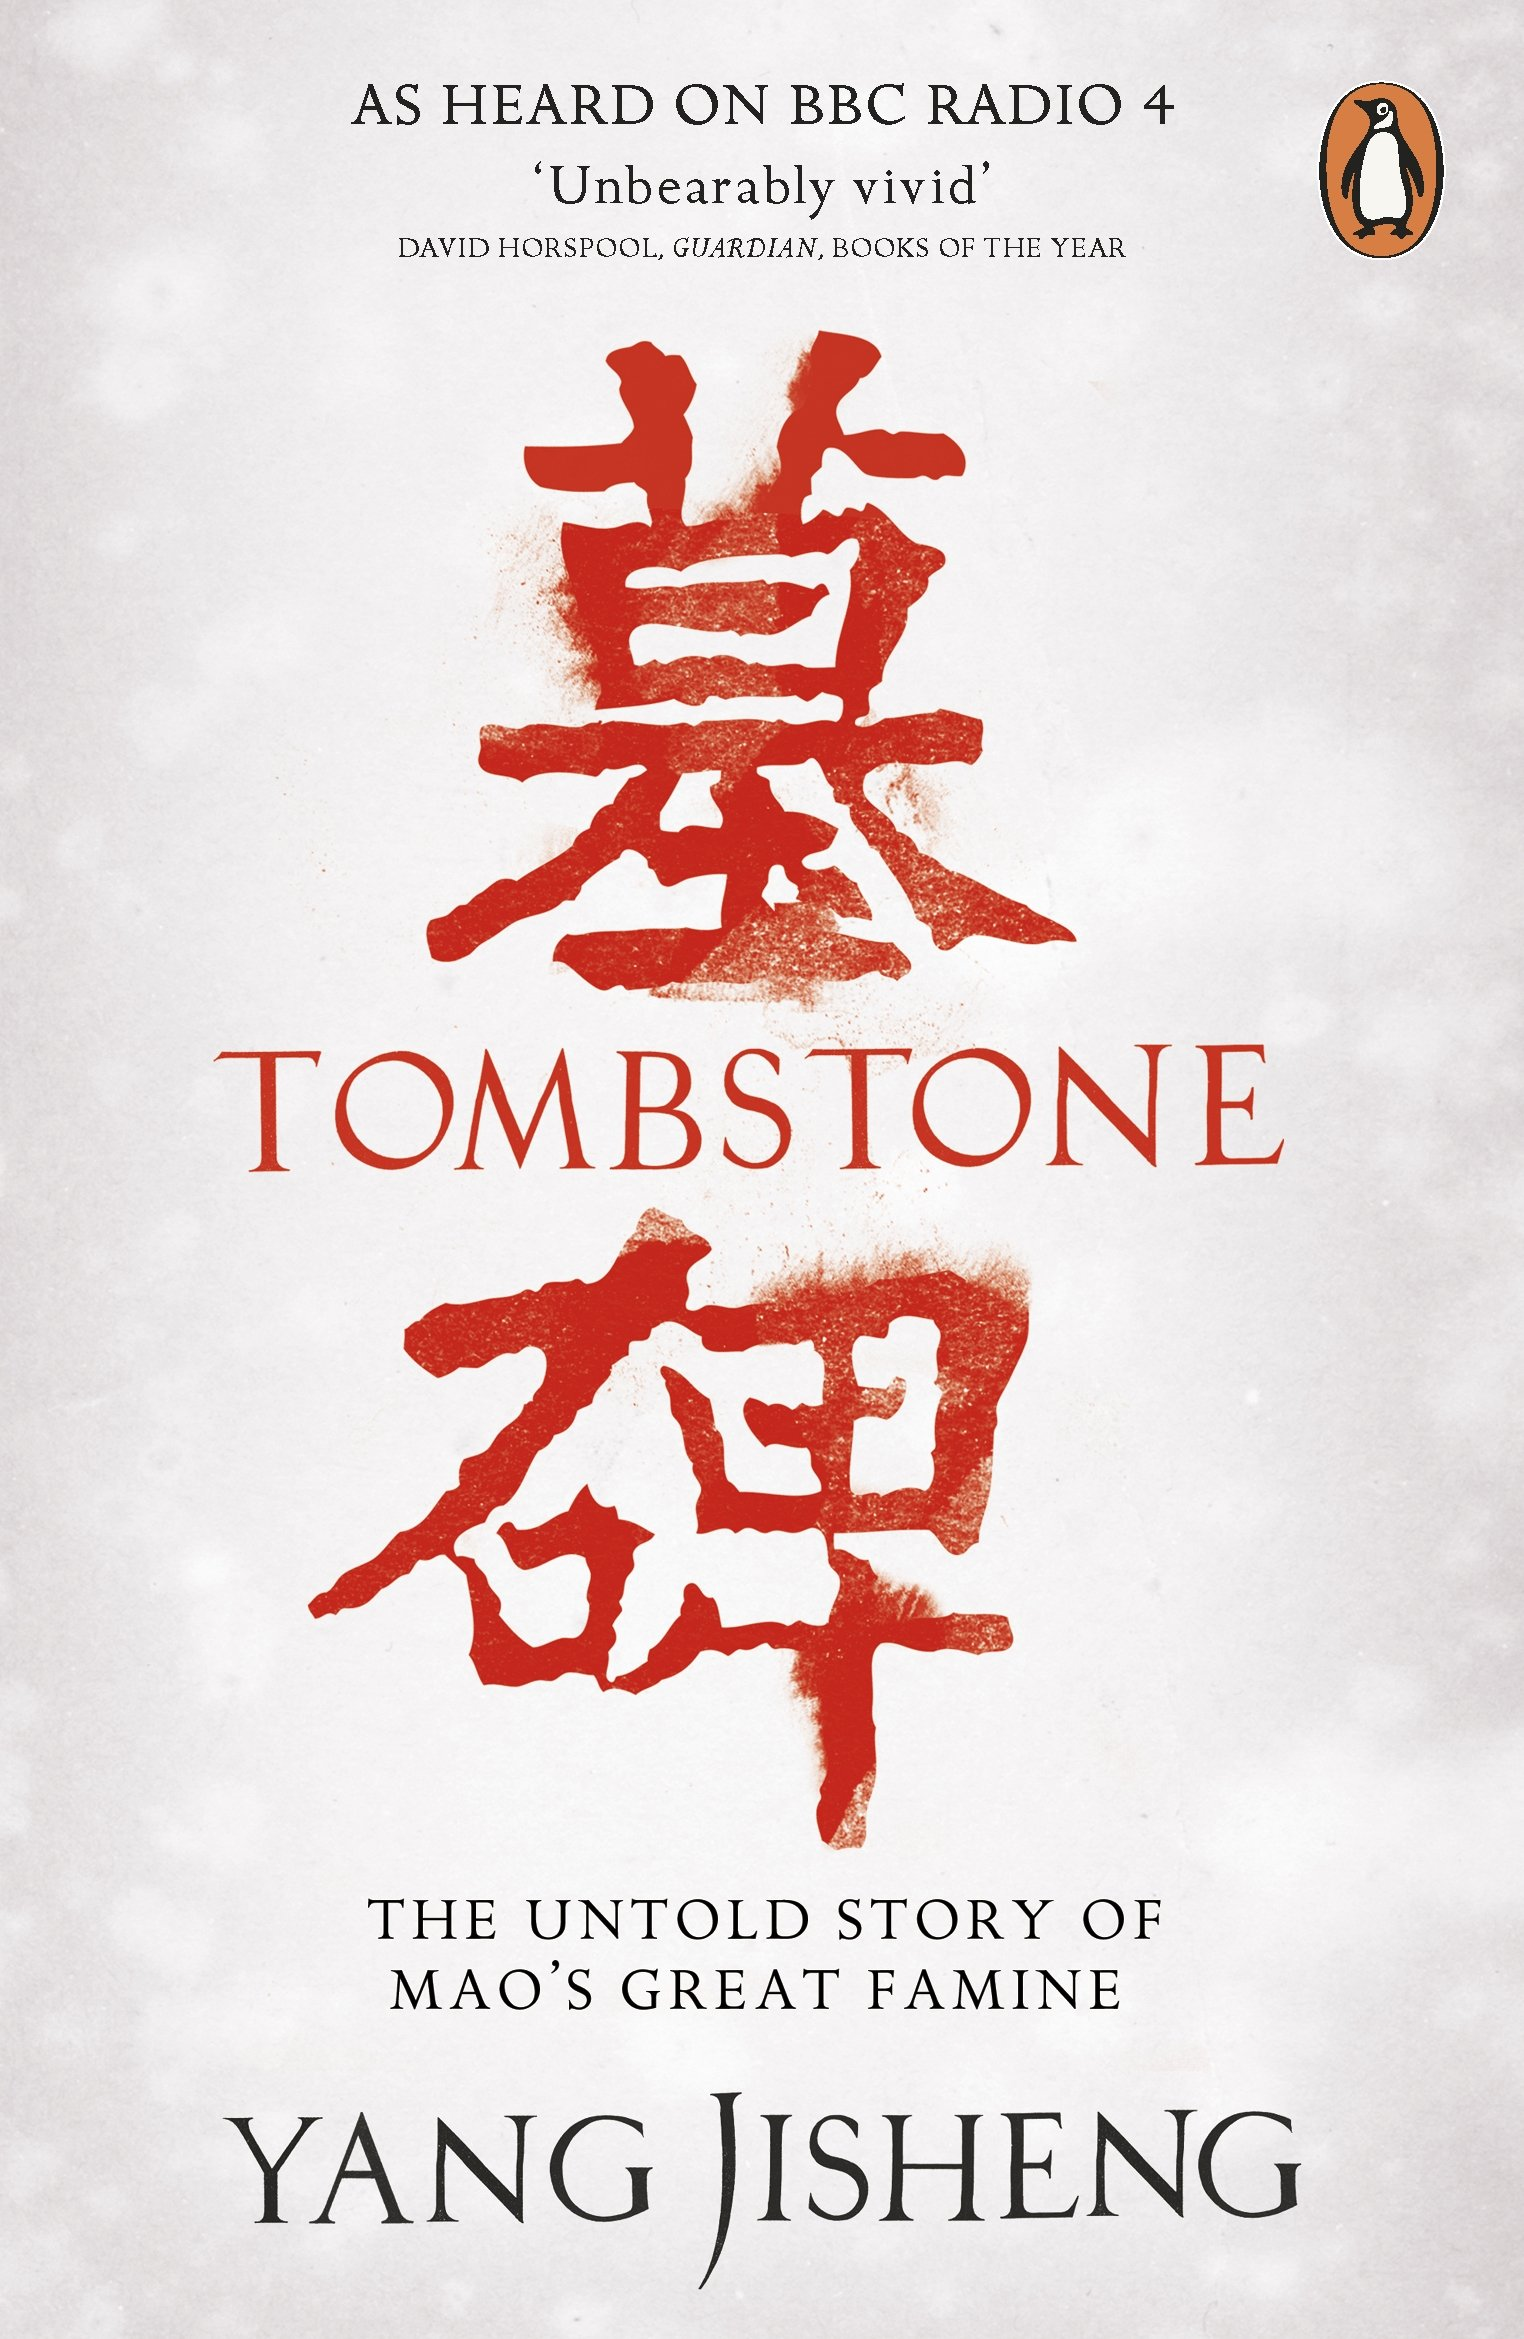 Tombstone: The Untold Story of Mao's Great Famine: Amazon.co.uk: Jisheng,  Yang, Friedman, Edward, Jian, Guo, Mosher, Stacy: 9780241956984: Books